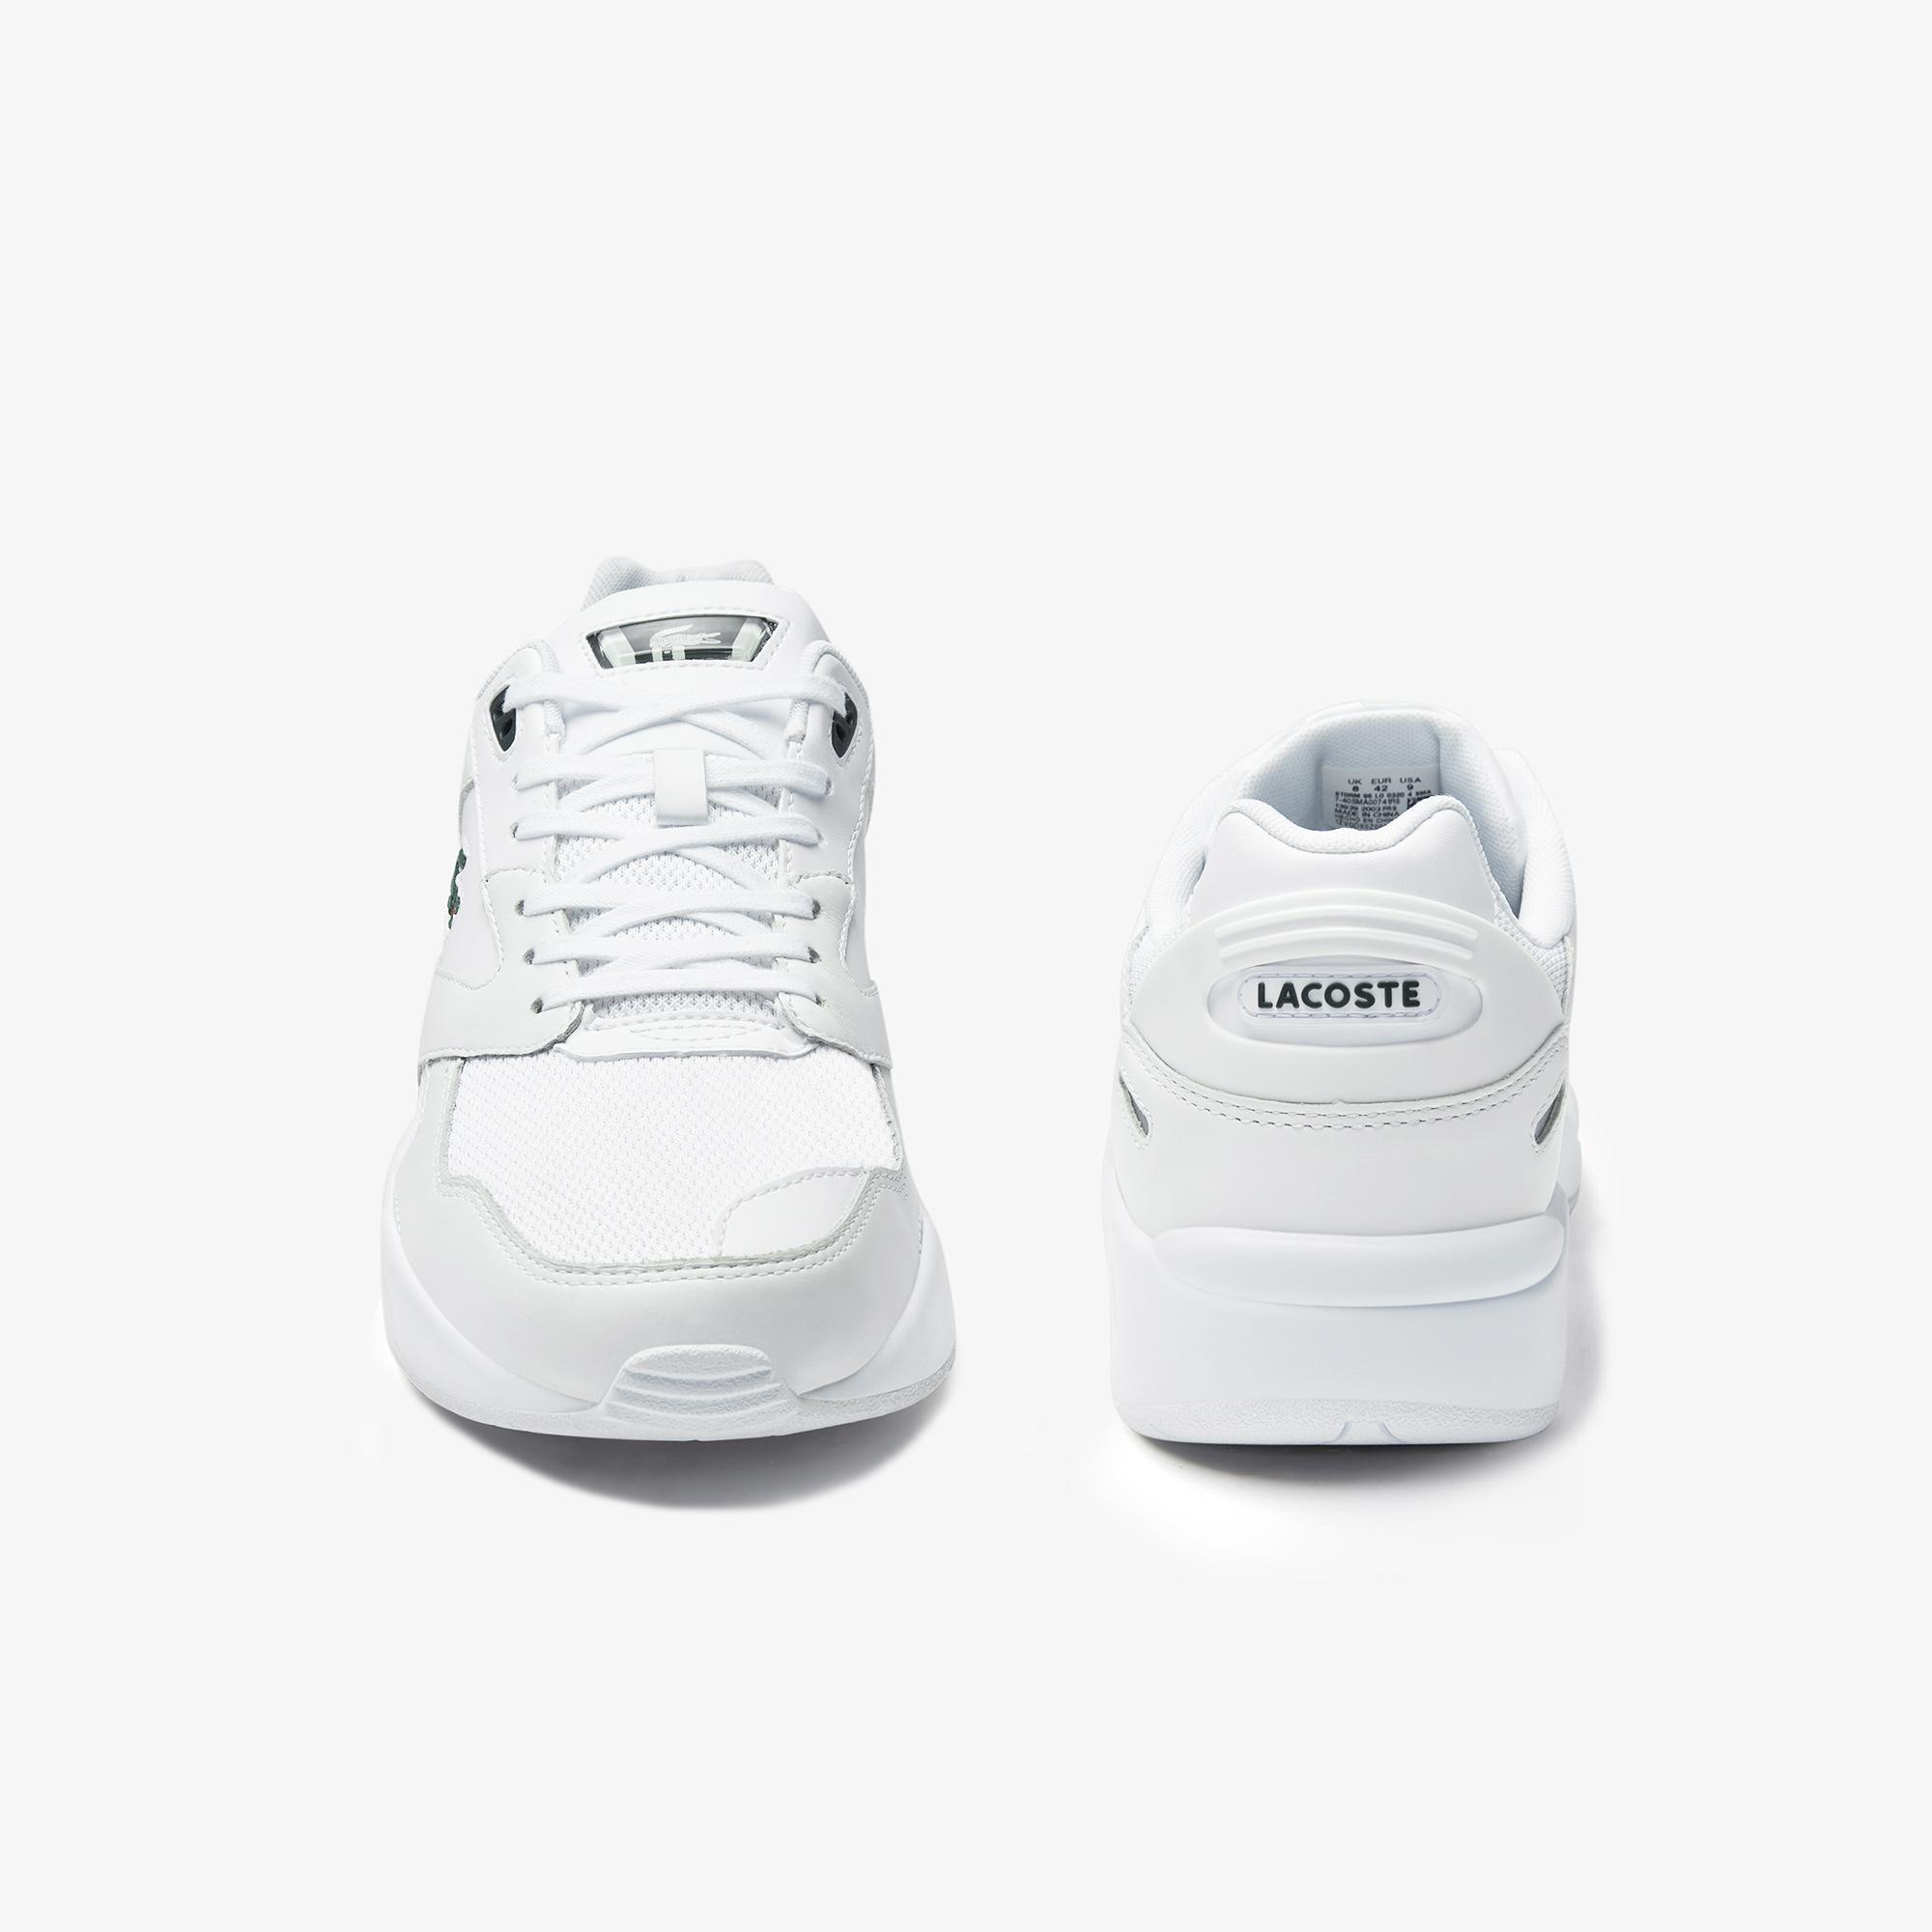 Lacoste Men's Storm 96 Lo 0120 3 Sma Sneakers